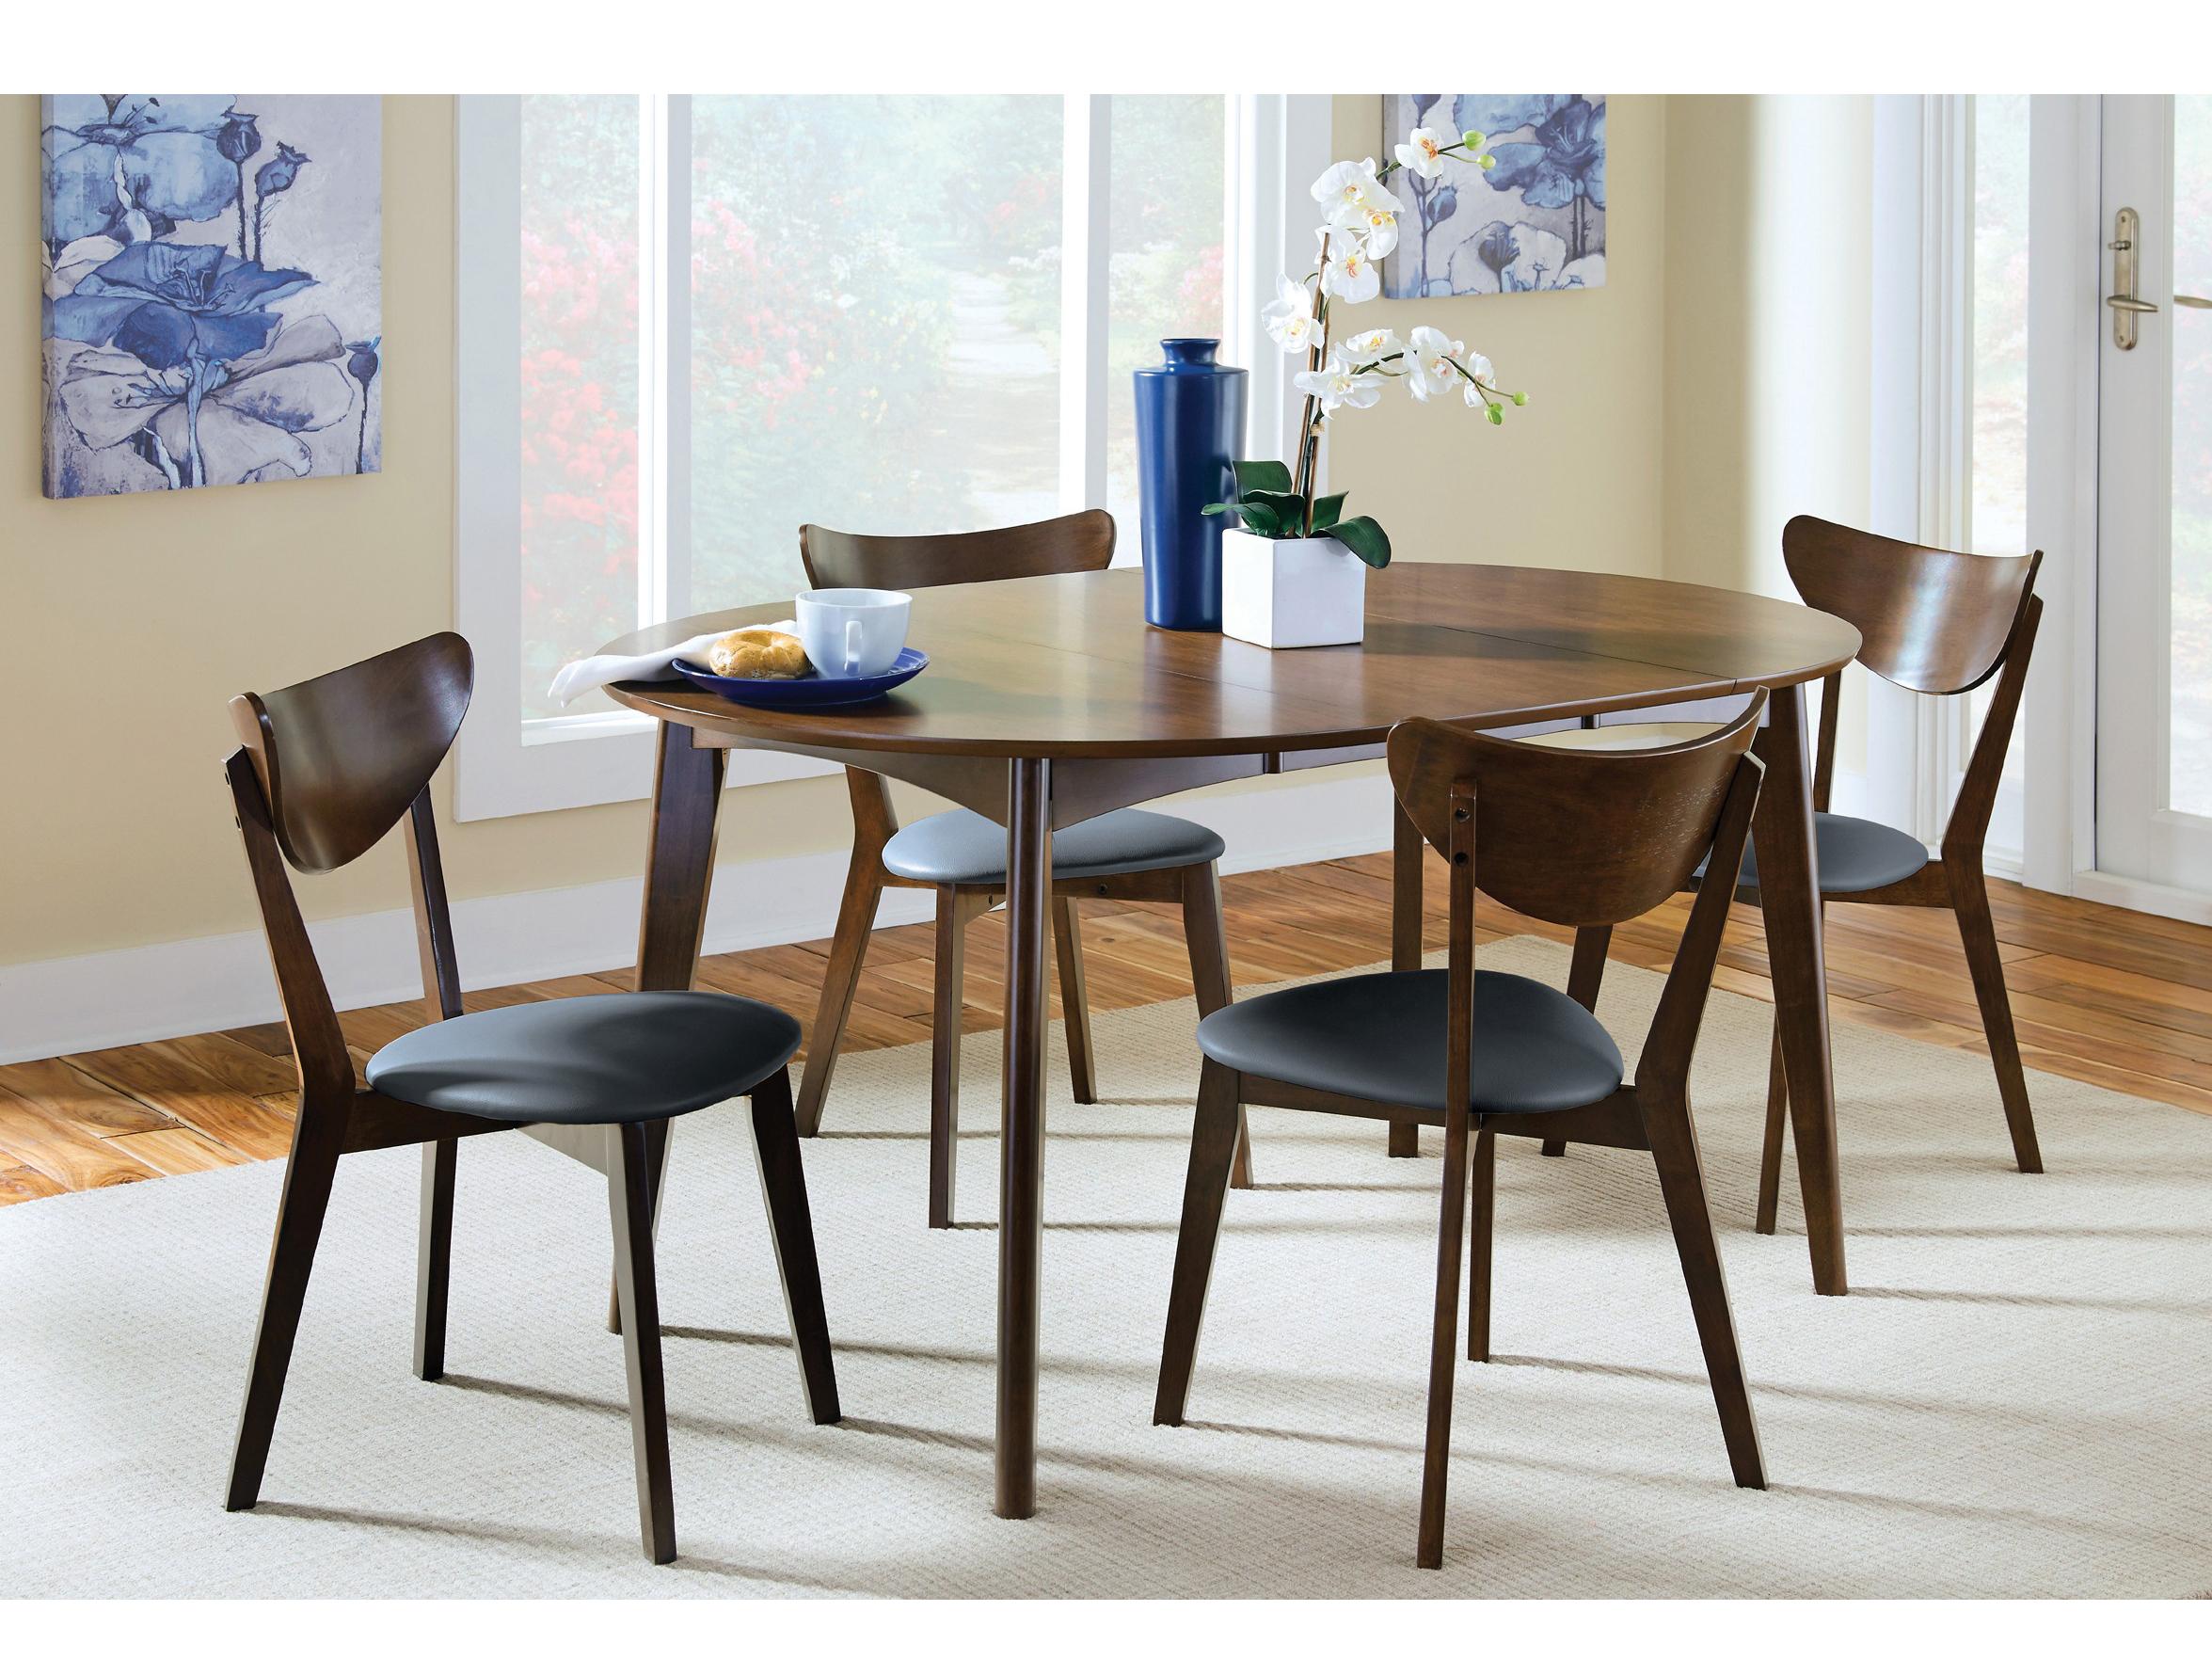 Dark Walnut Dining Table Set Shop For Affordable Home Furniture - Dark walnut dining table and chairs